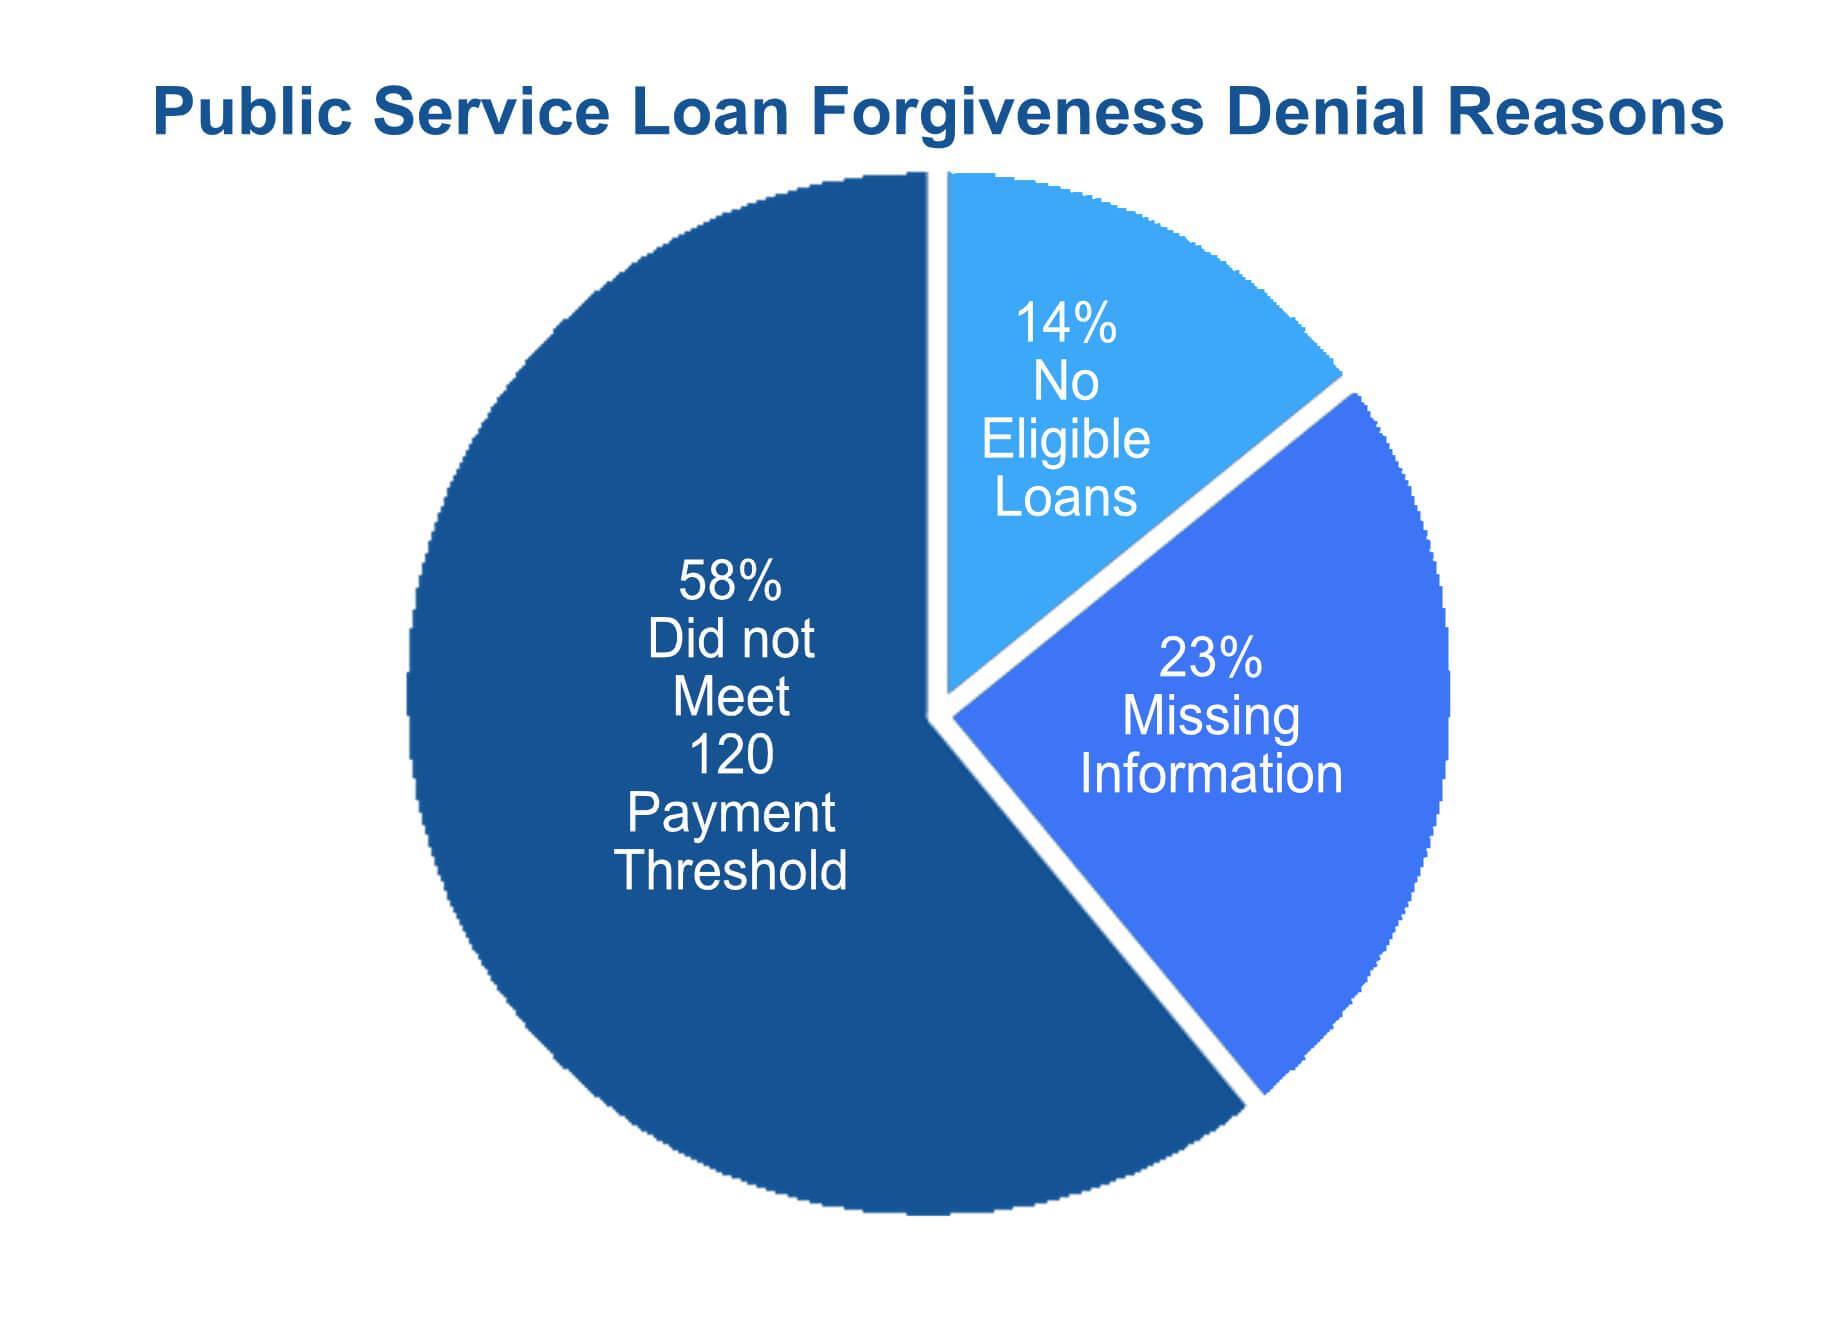 Public Service Loan Forgiveness Denial Reasons